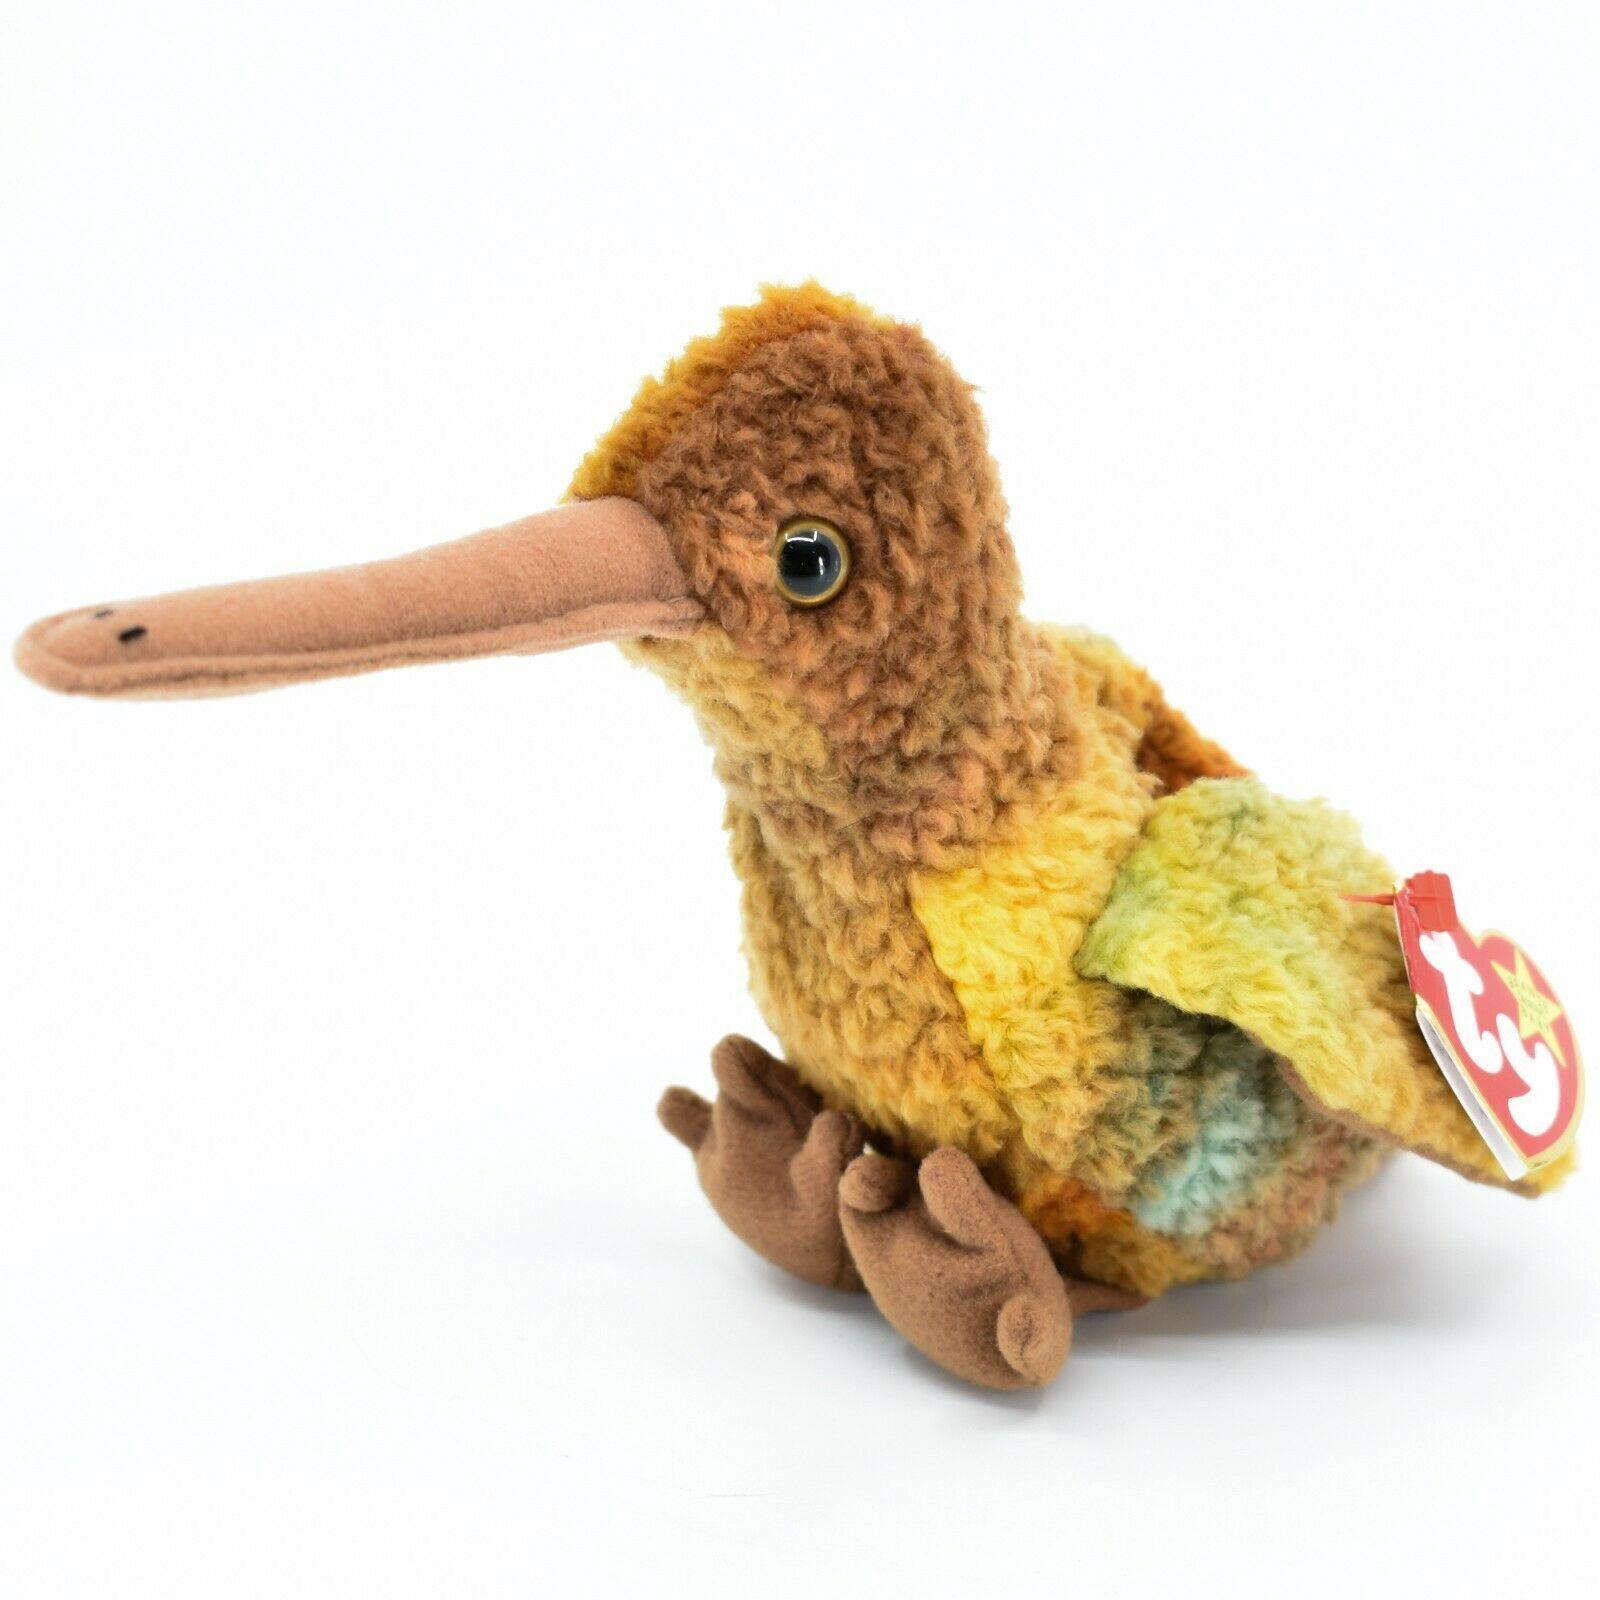 1998 TY Beanie Baby Beak the Kiwi Bird Beanbag Plush Toy Doll